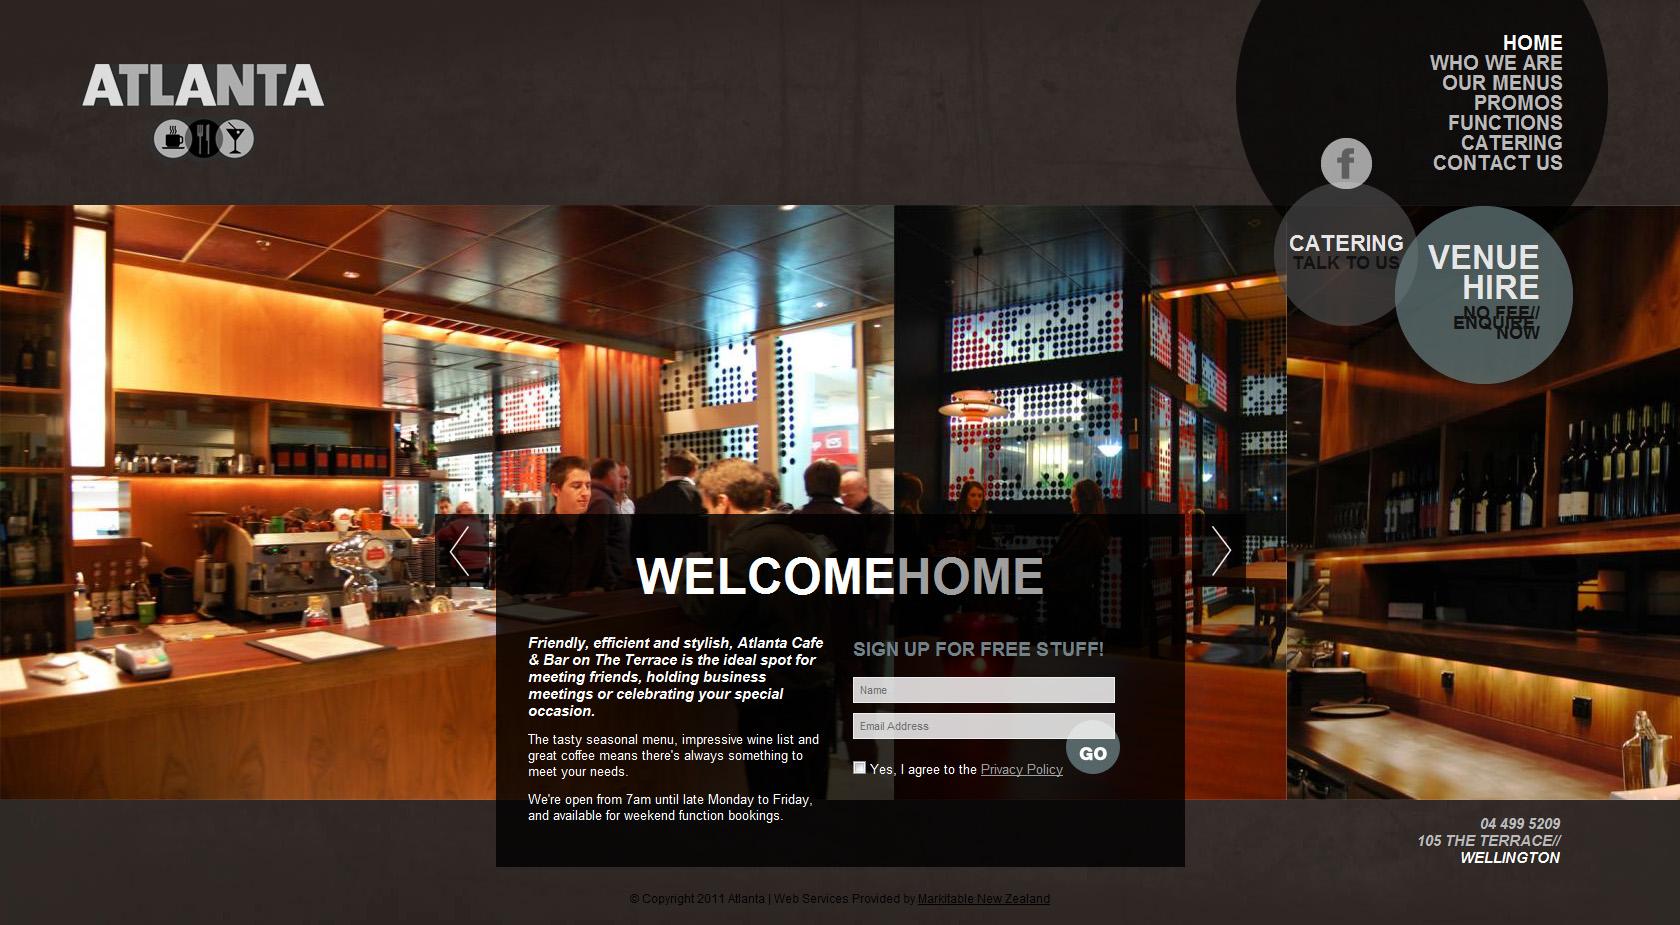 Atlanta Cafe & Bar Website Screenshot